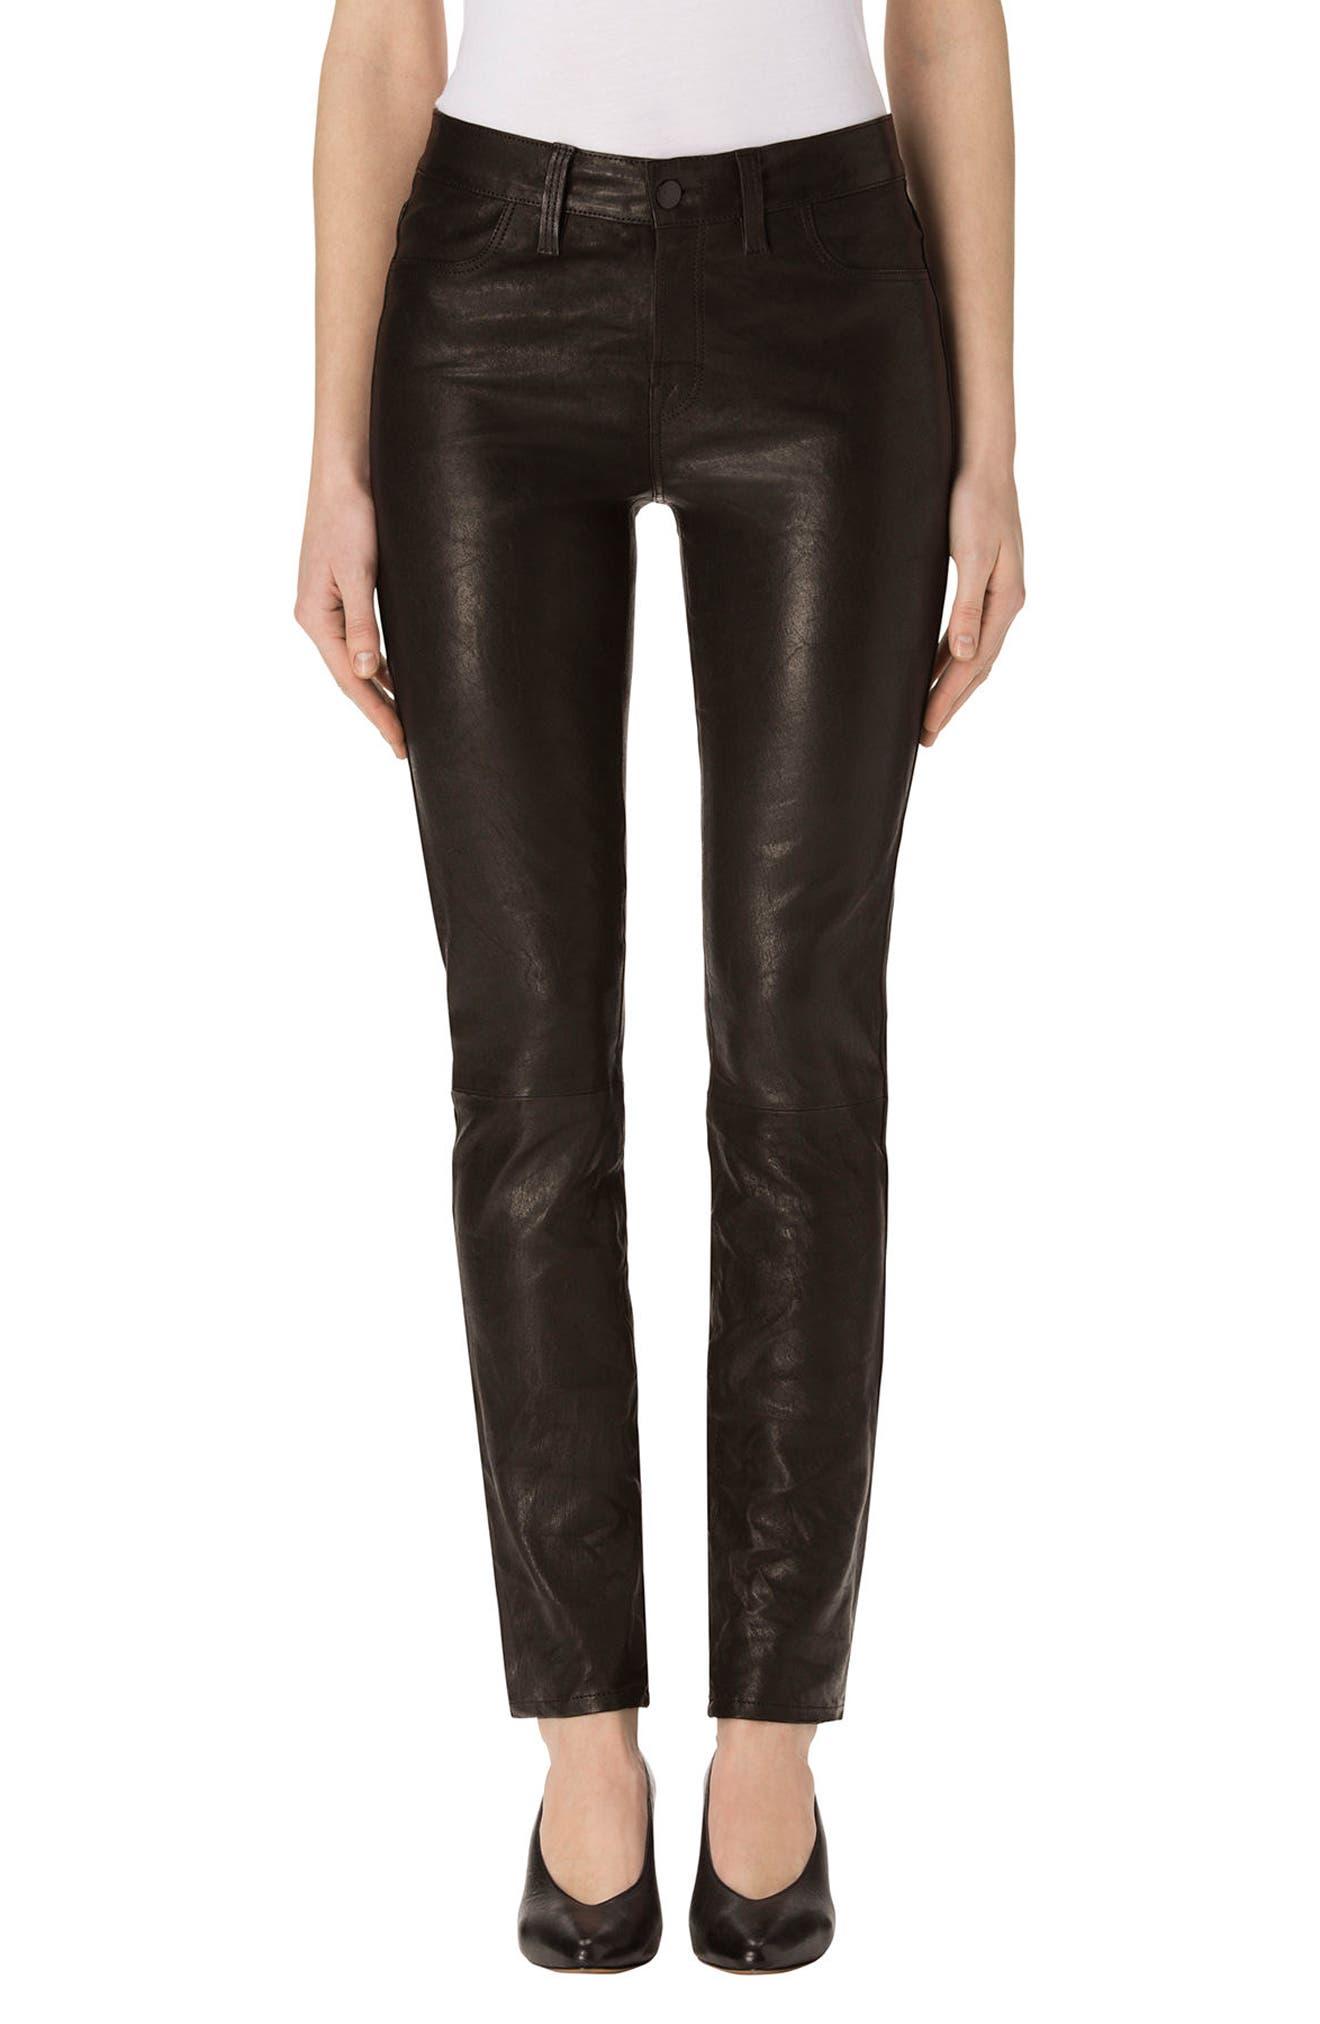 J Brand Maude Leather Cigarette Pants